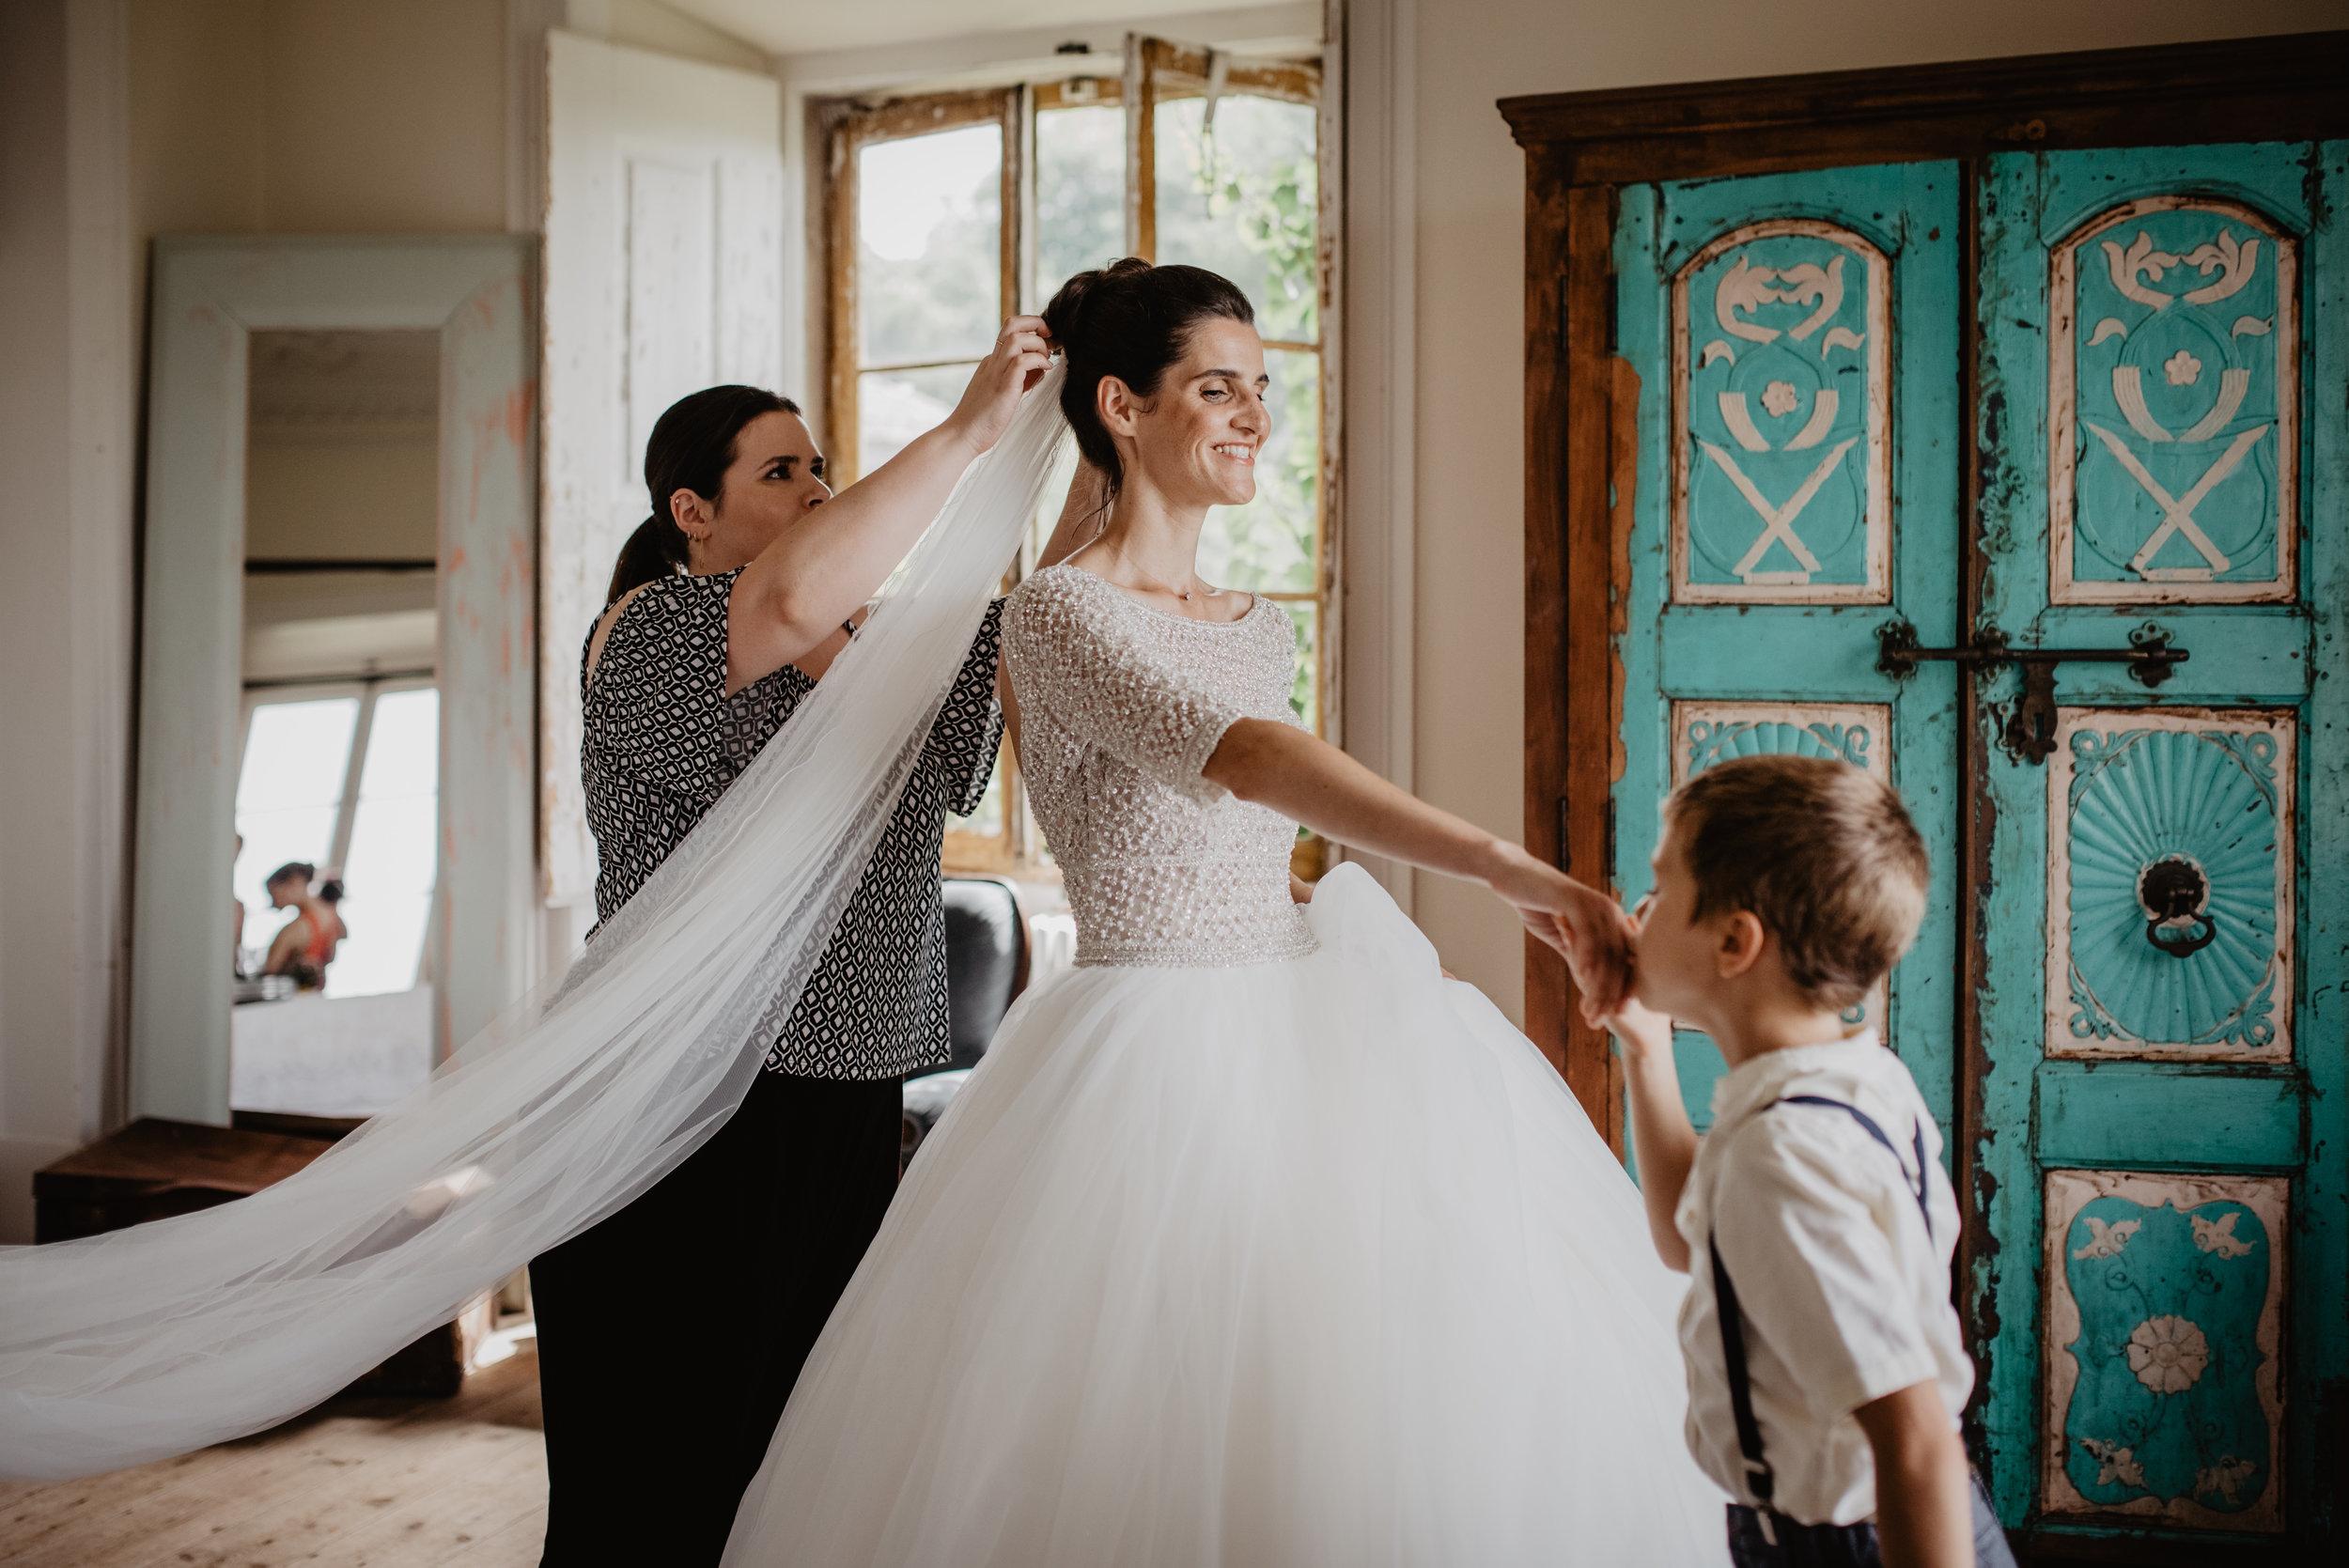 Lapela-photography-wedding-sintra-portugal-44.jpg